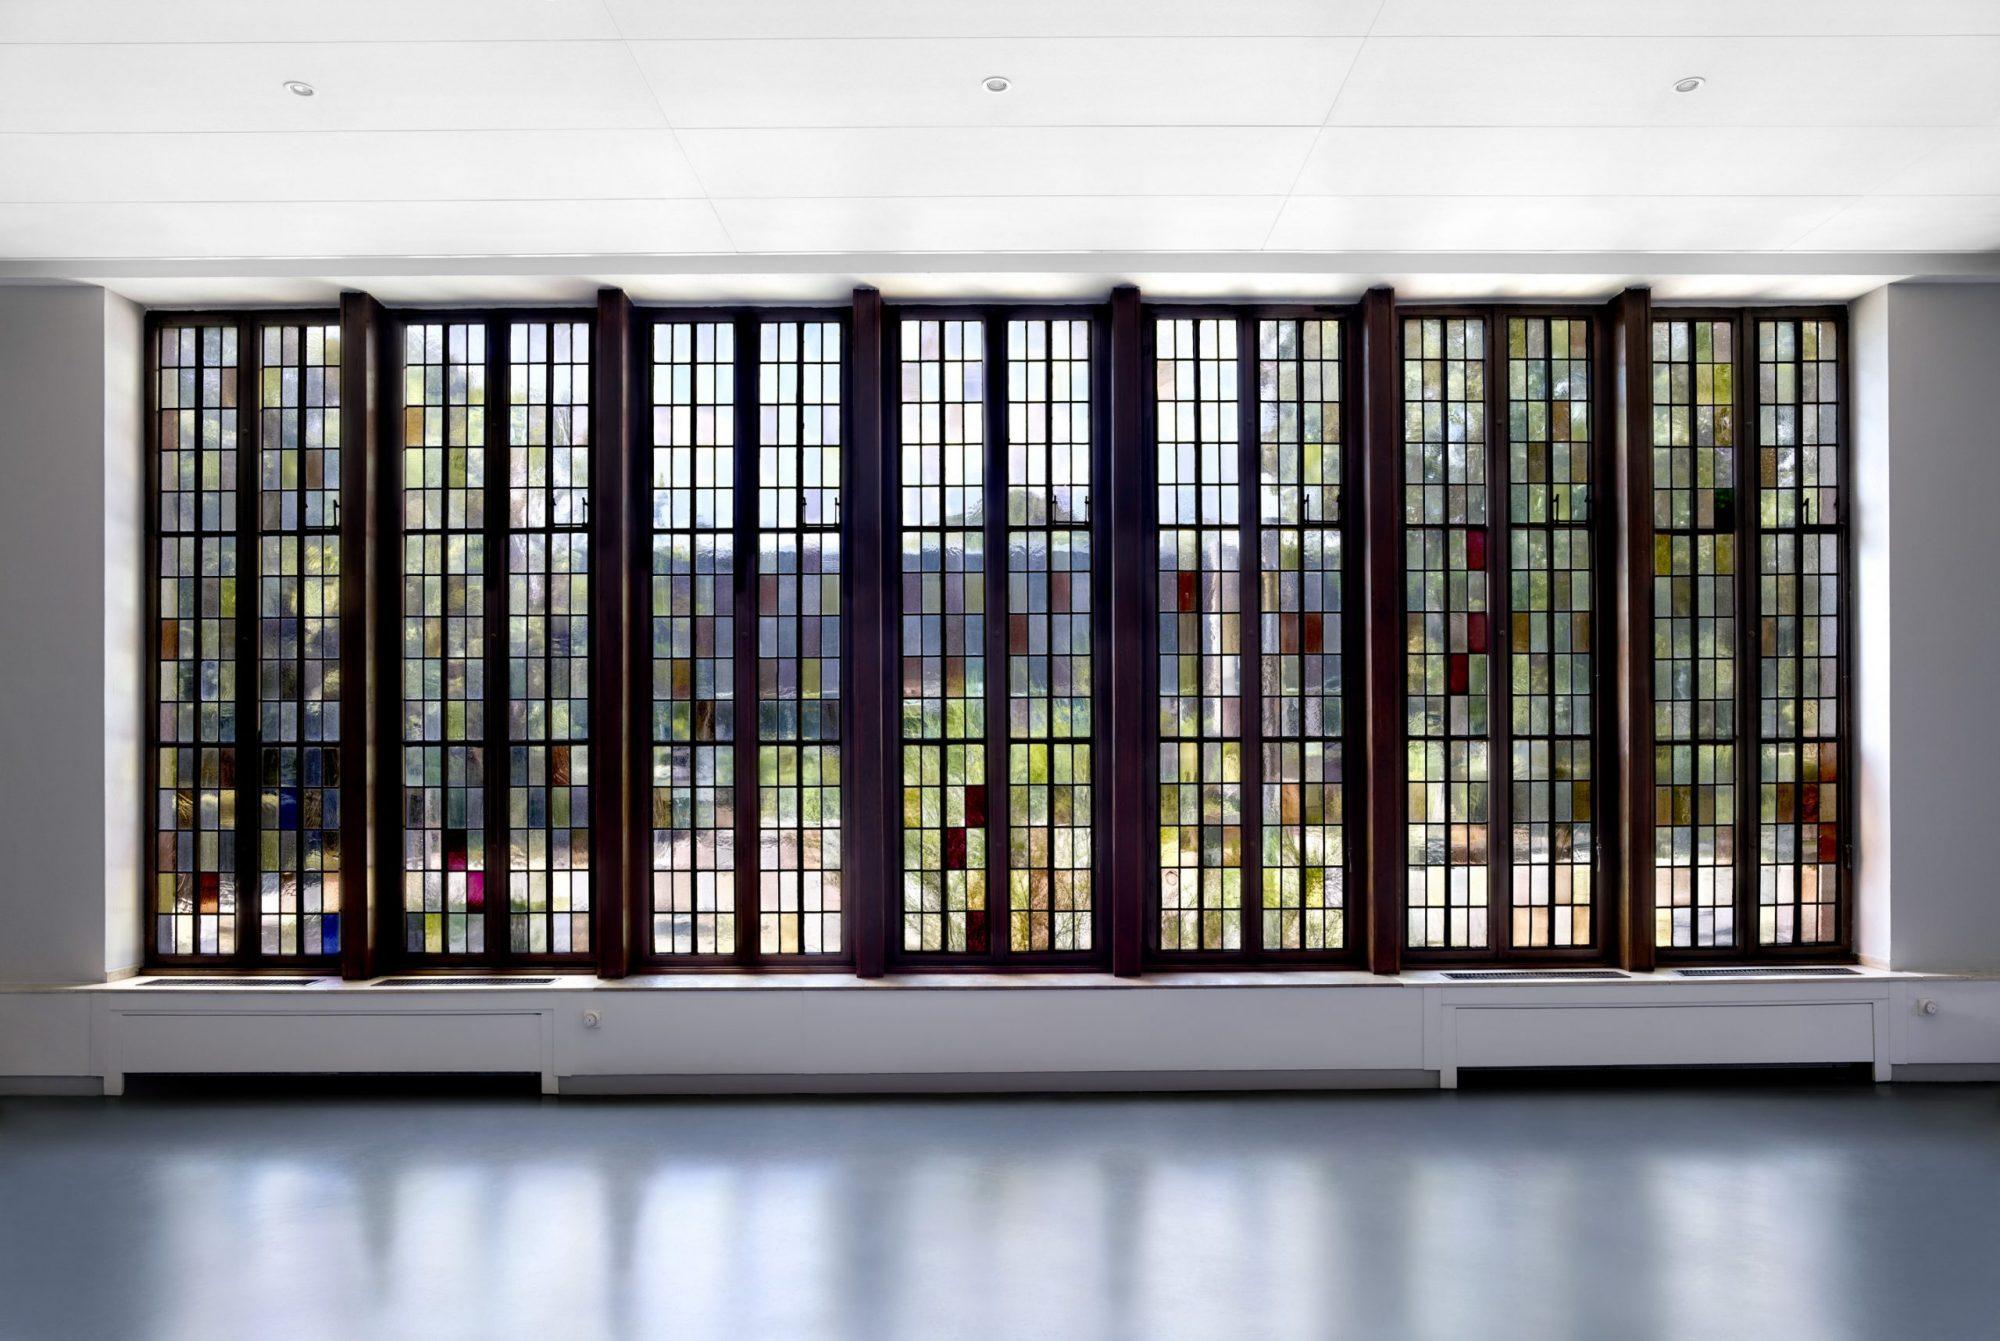 Candida Höfer, Neue Galerie Gladbeck I 2019